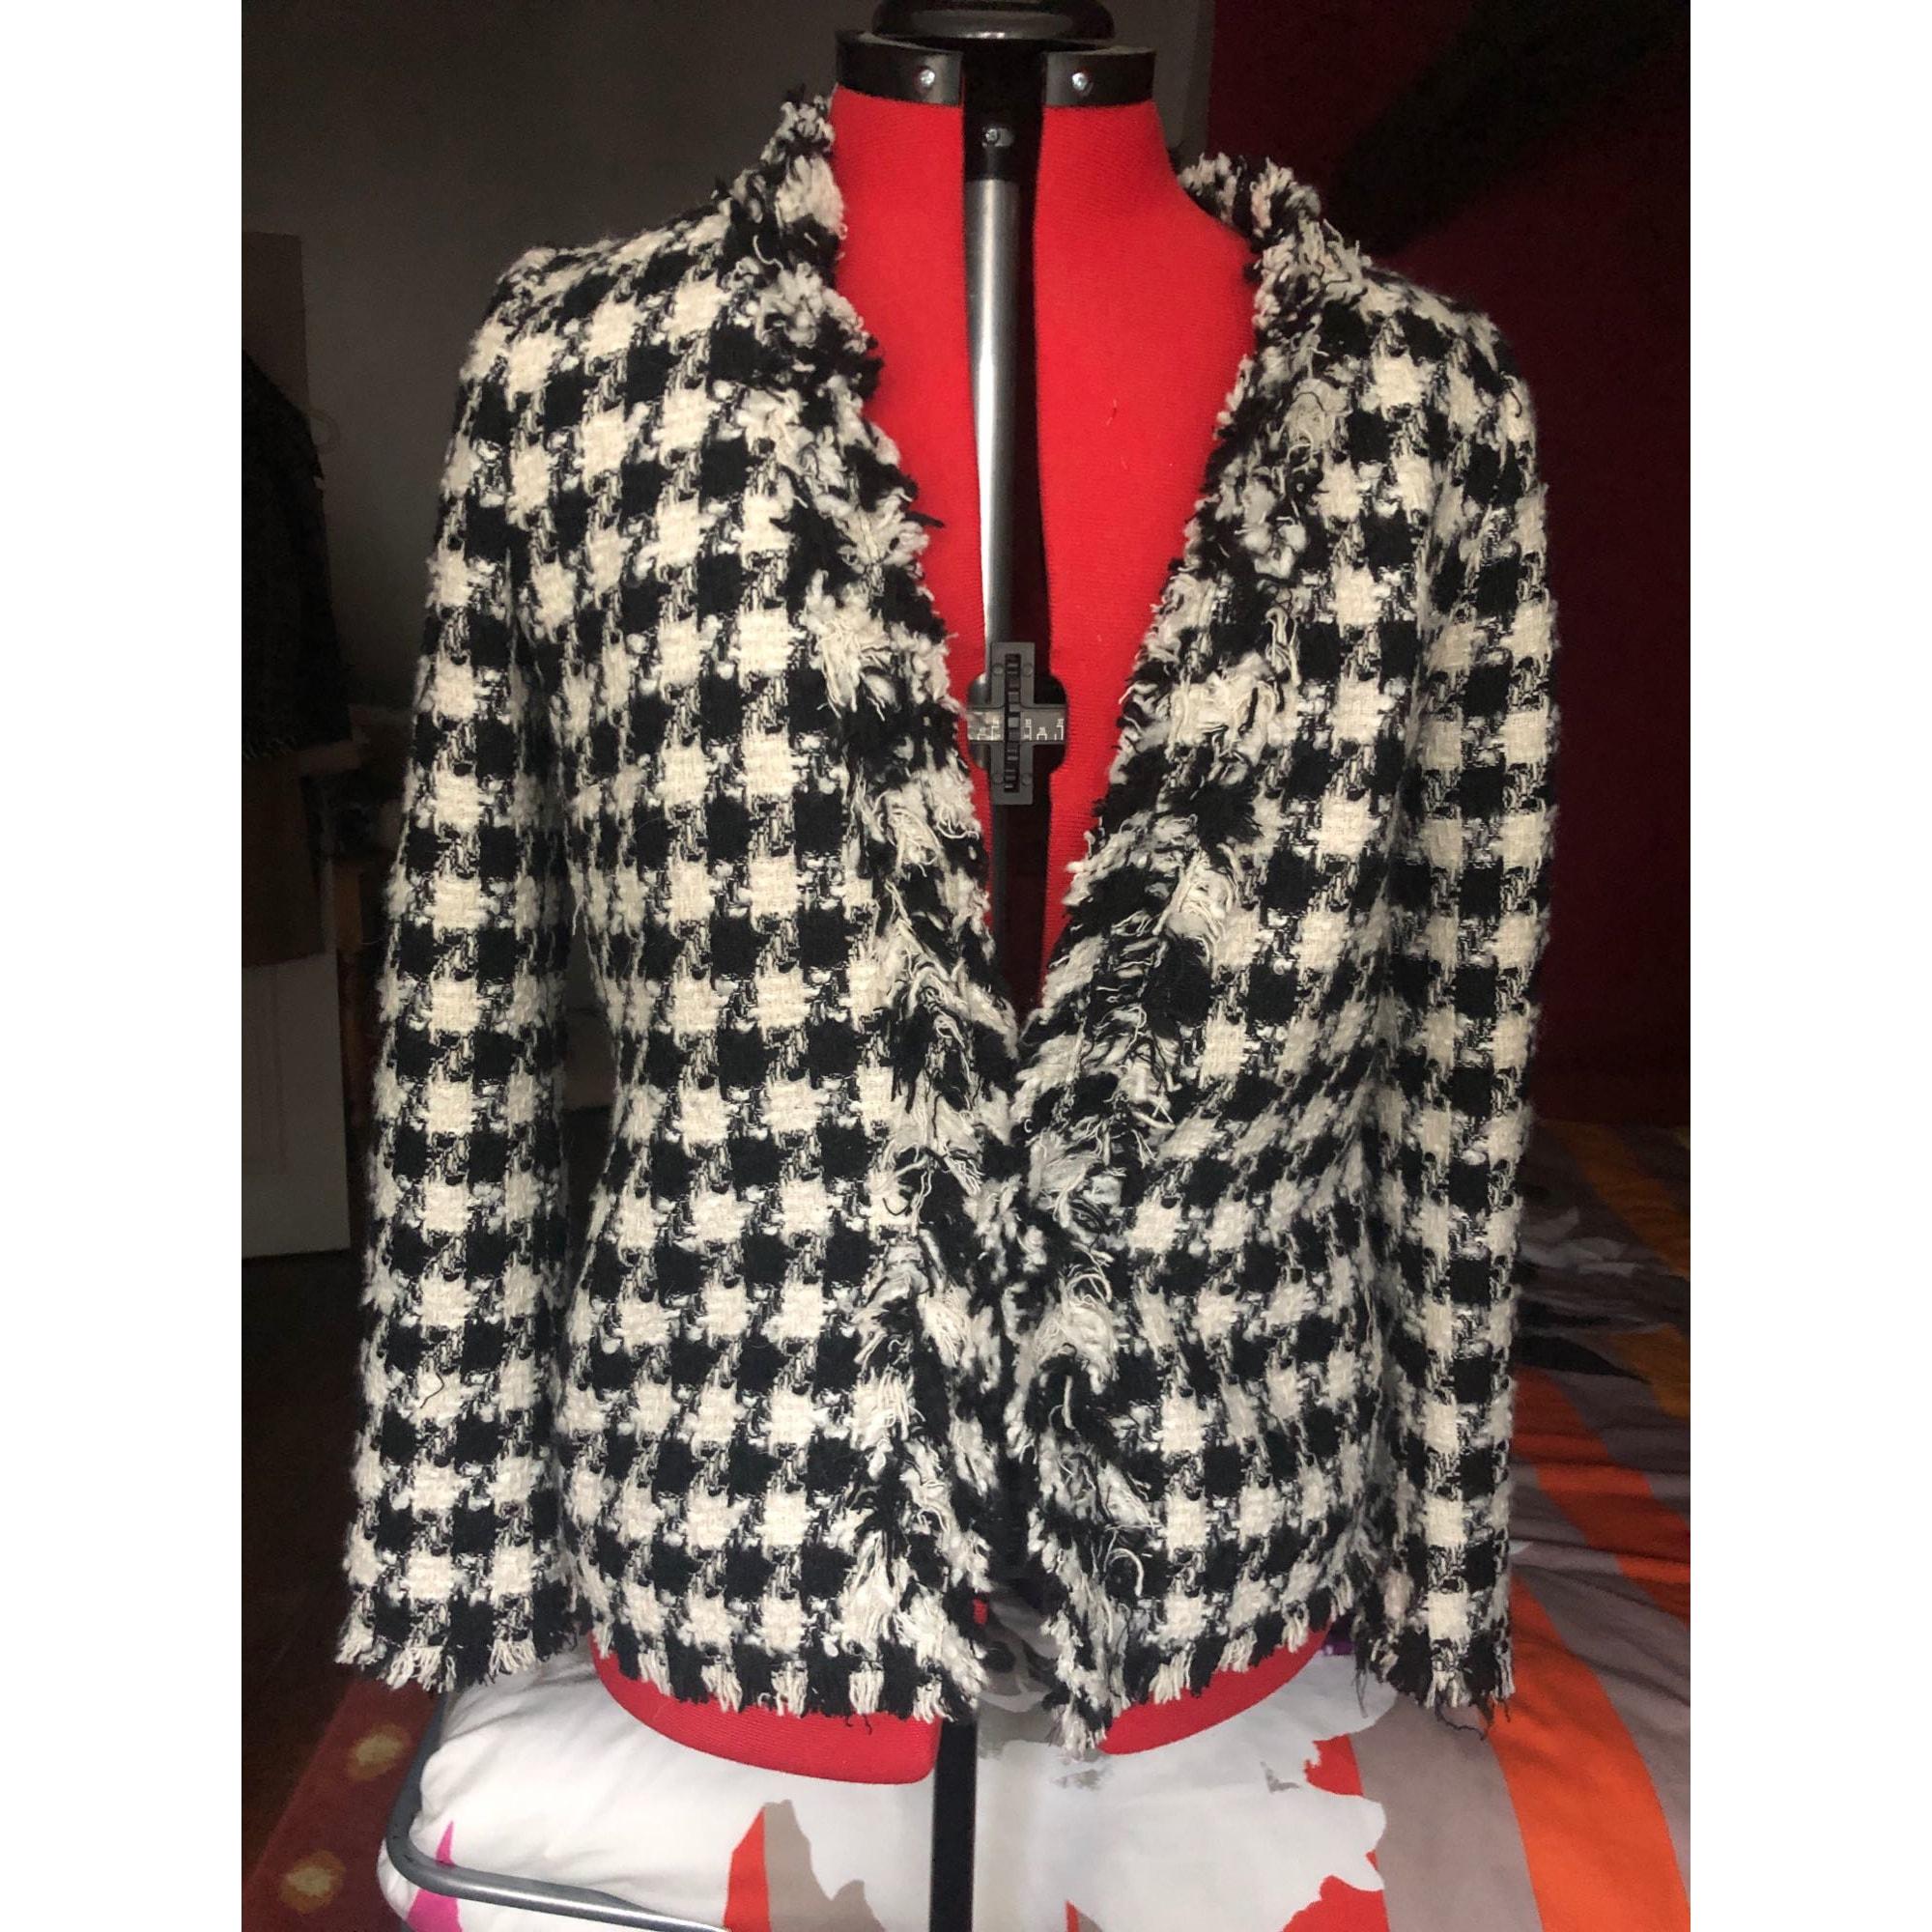 Blazer, veste tailleur ZARA Noire et blanche